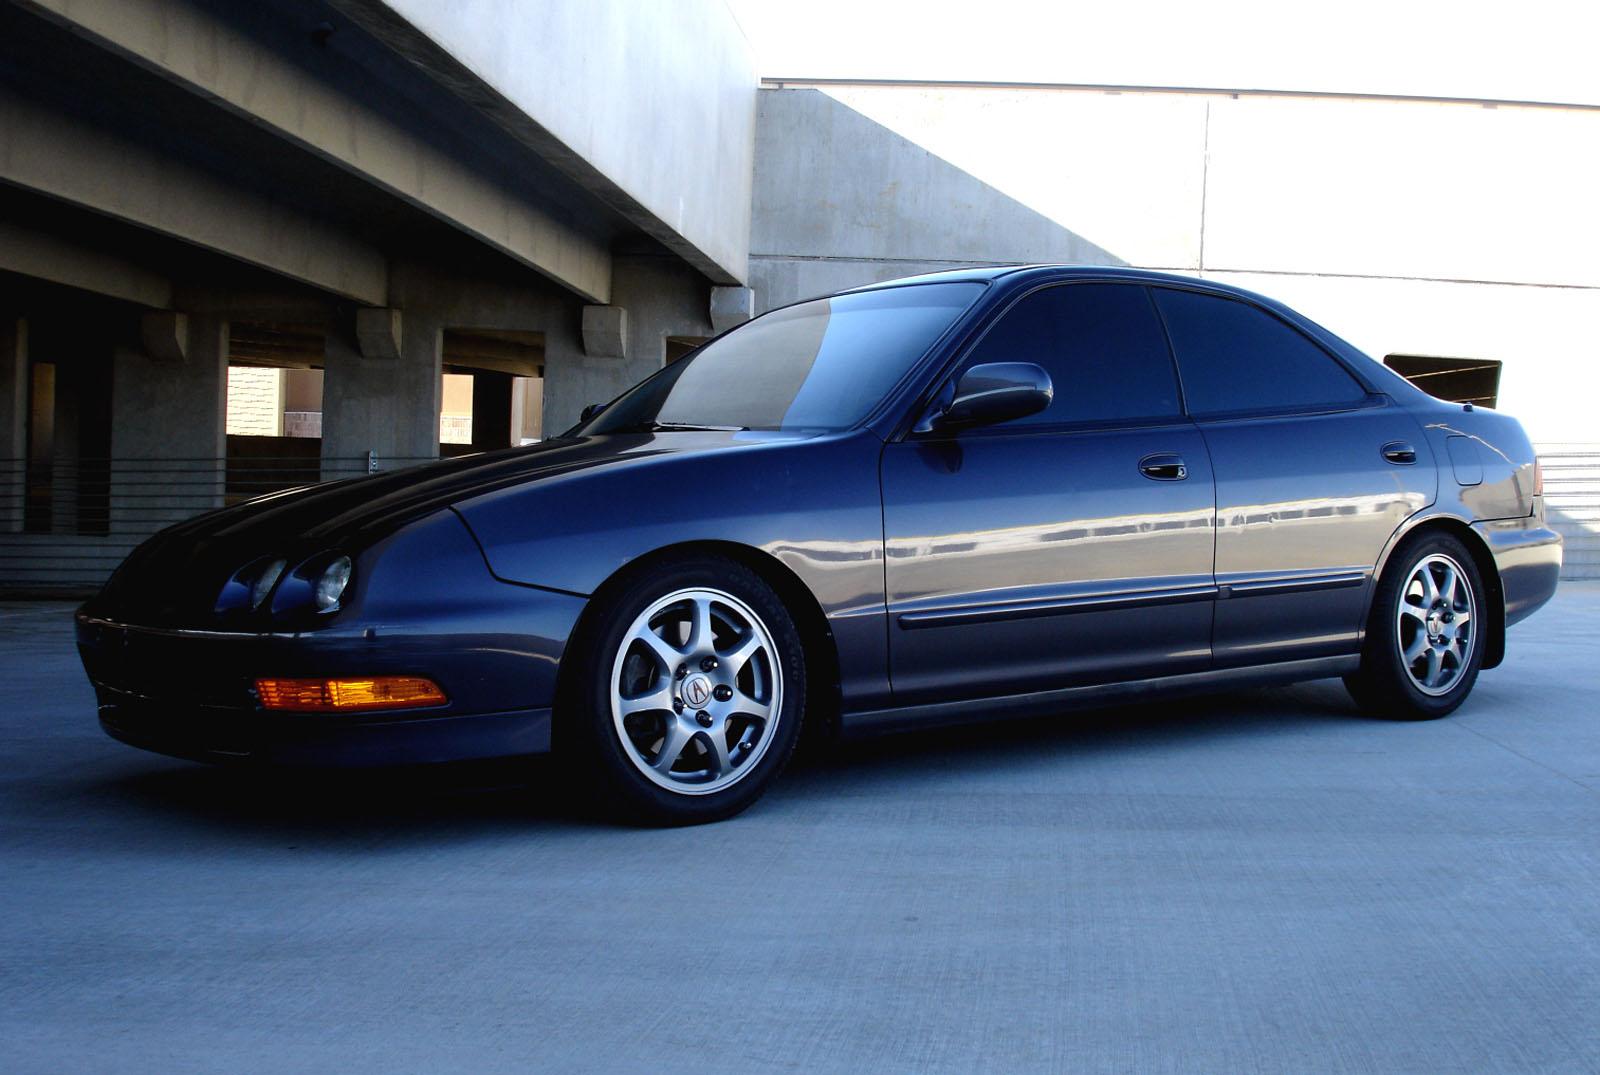 1994 Acura Db8 Integra Gsr For Sale Hendersonvlle